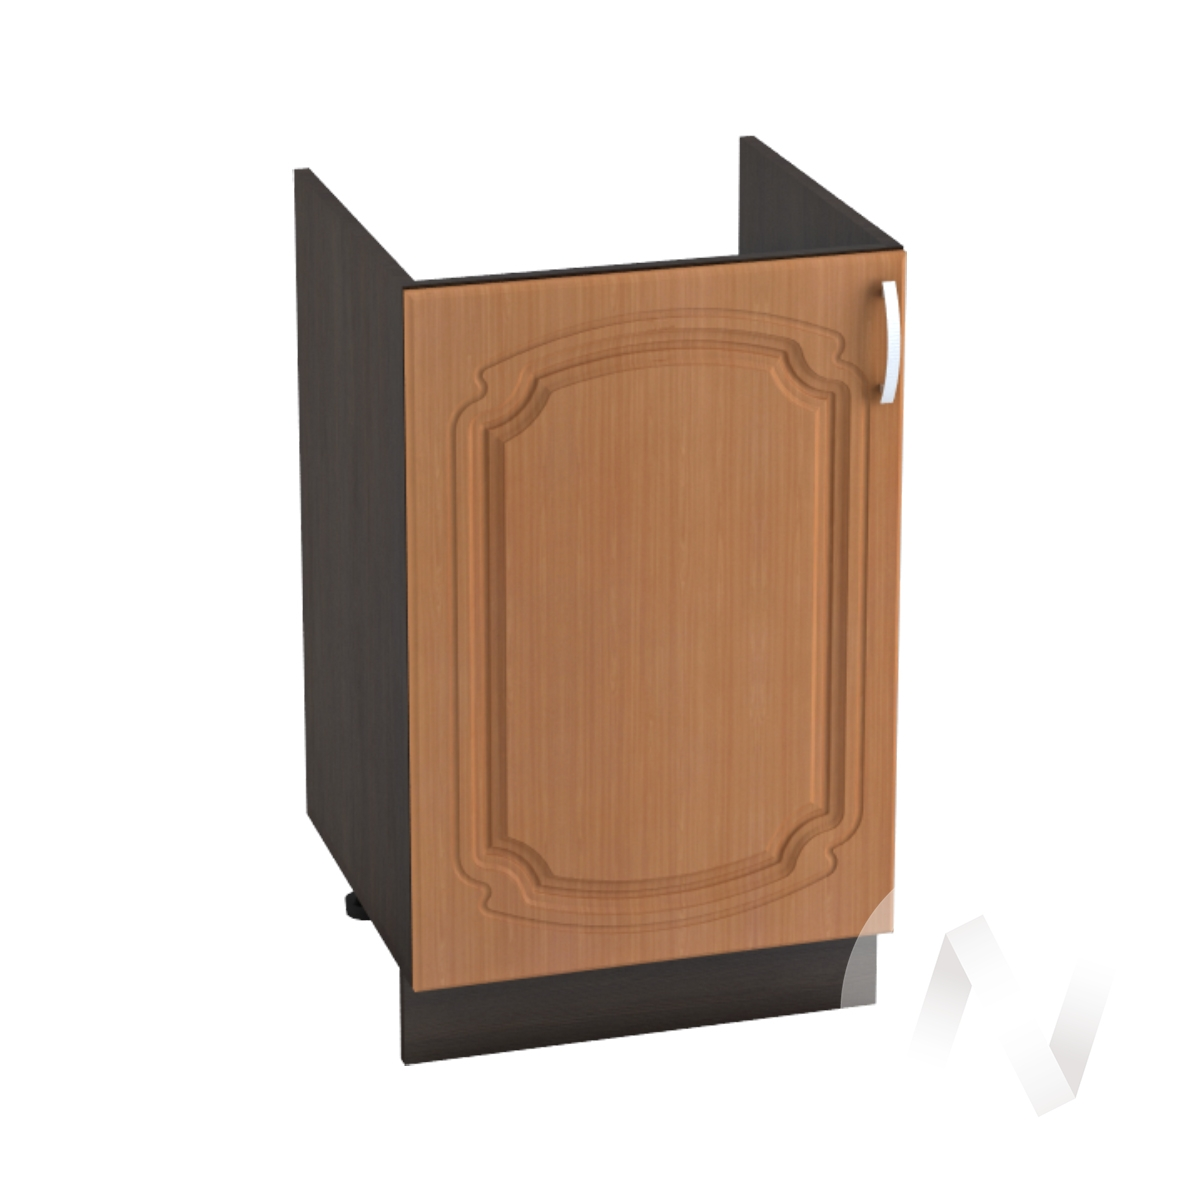 "Кухня ""Настя"": Шкаф нижний под мойку 500, ШНМ 500 (Орех миланский/корпус венге)"